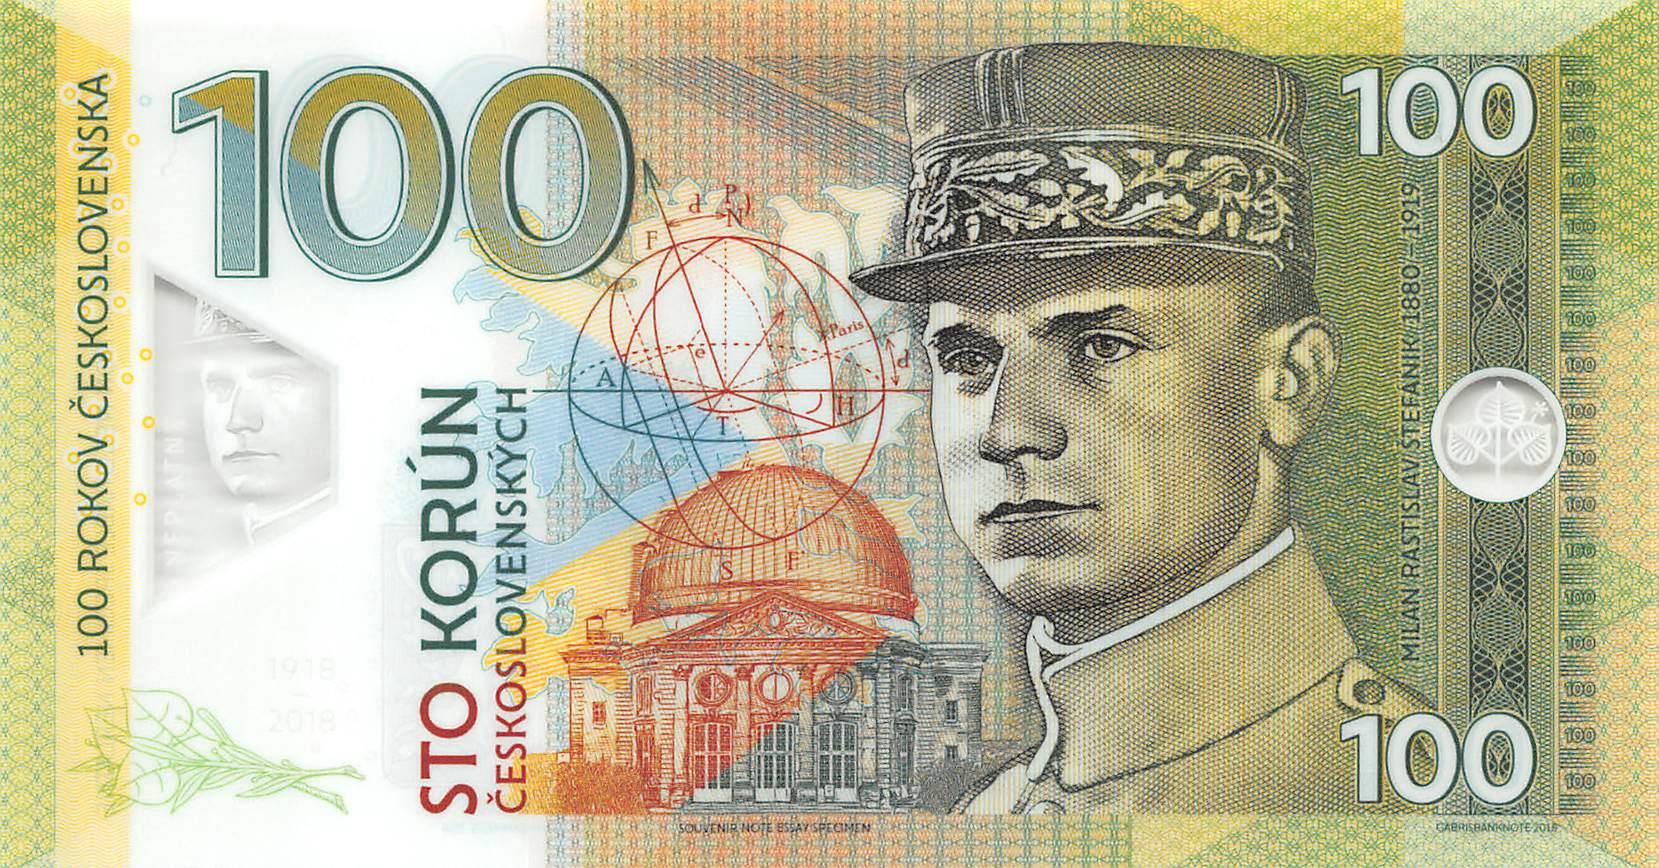 Czechoslovakia UNC /> Štefánik Private issue Polymer 100 Korun Specimen 2018